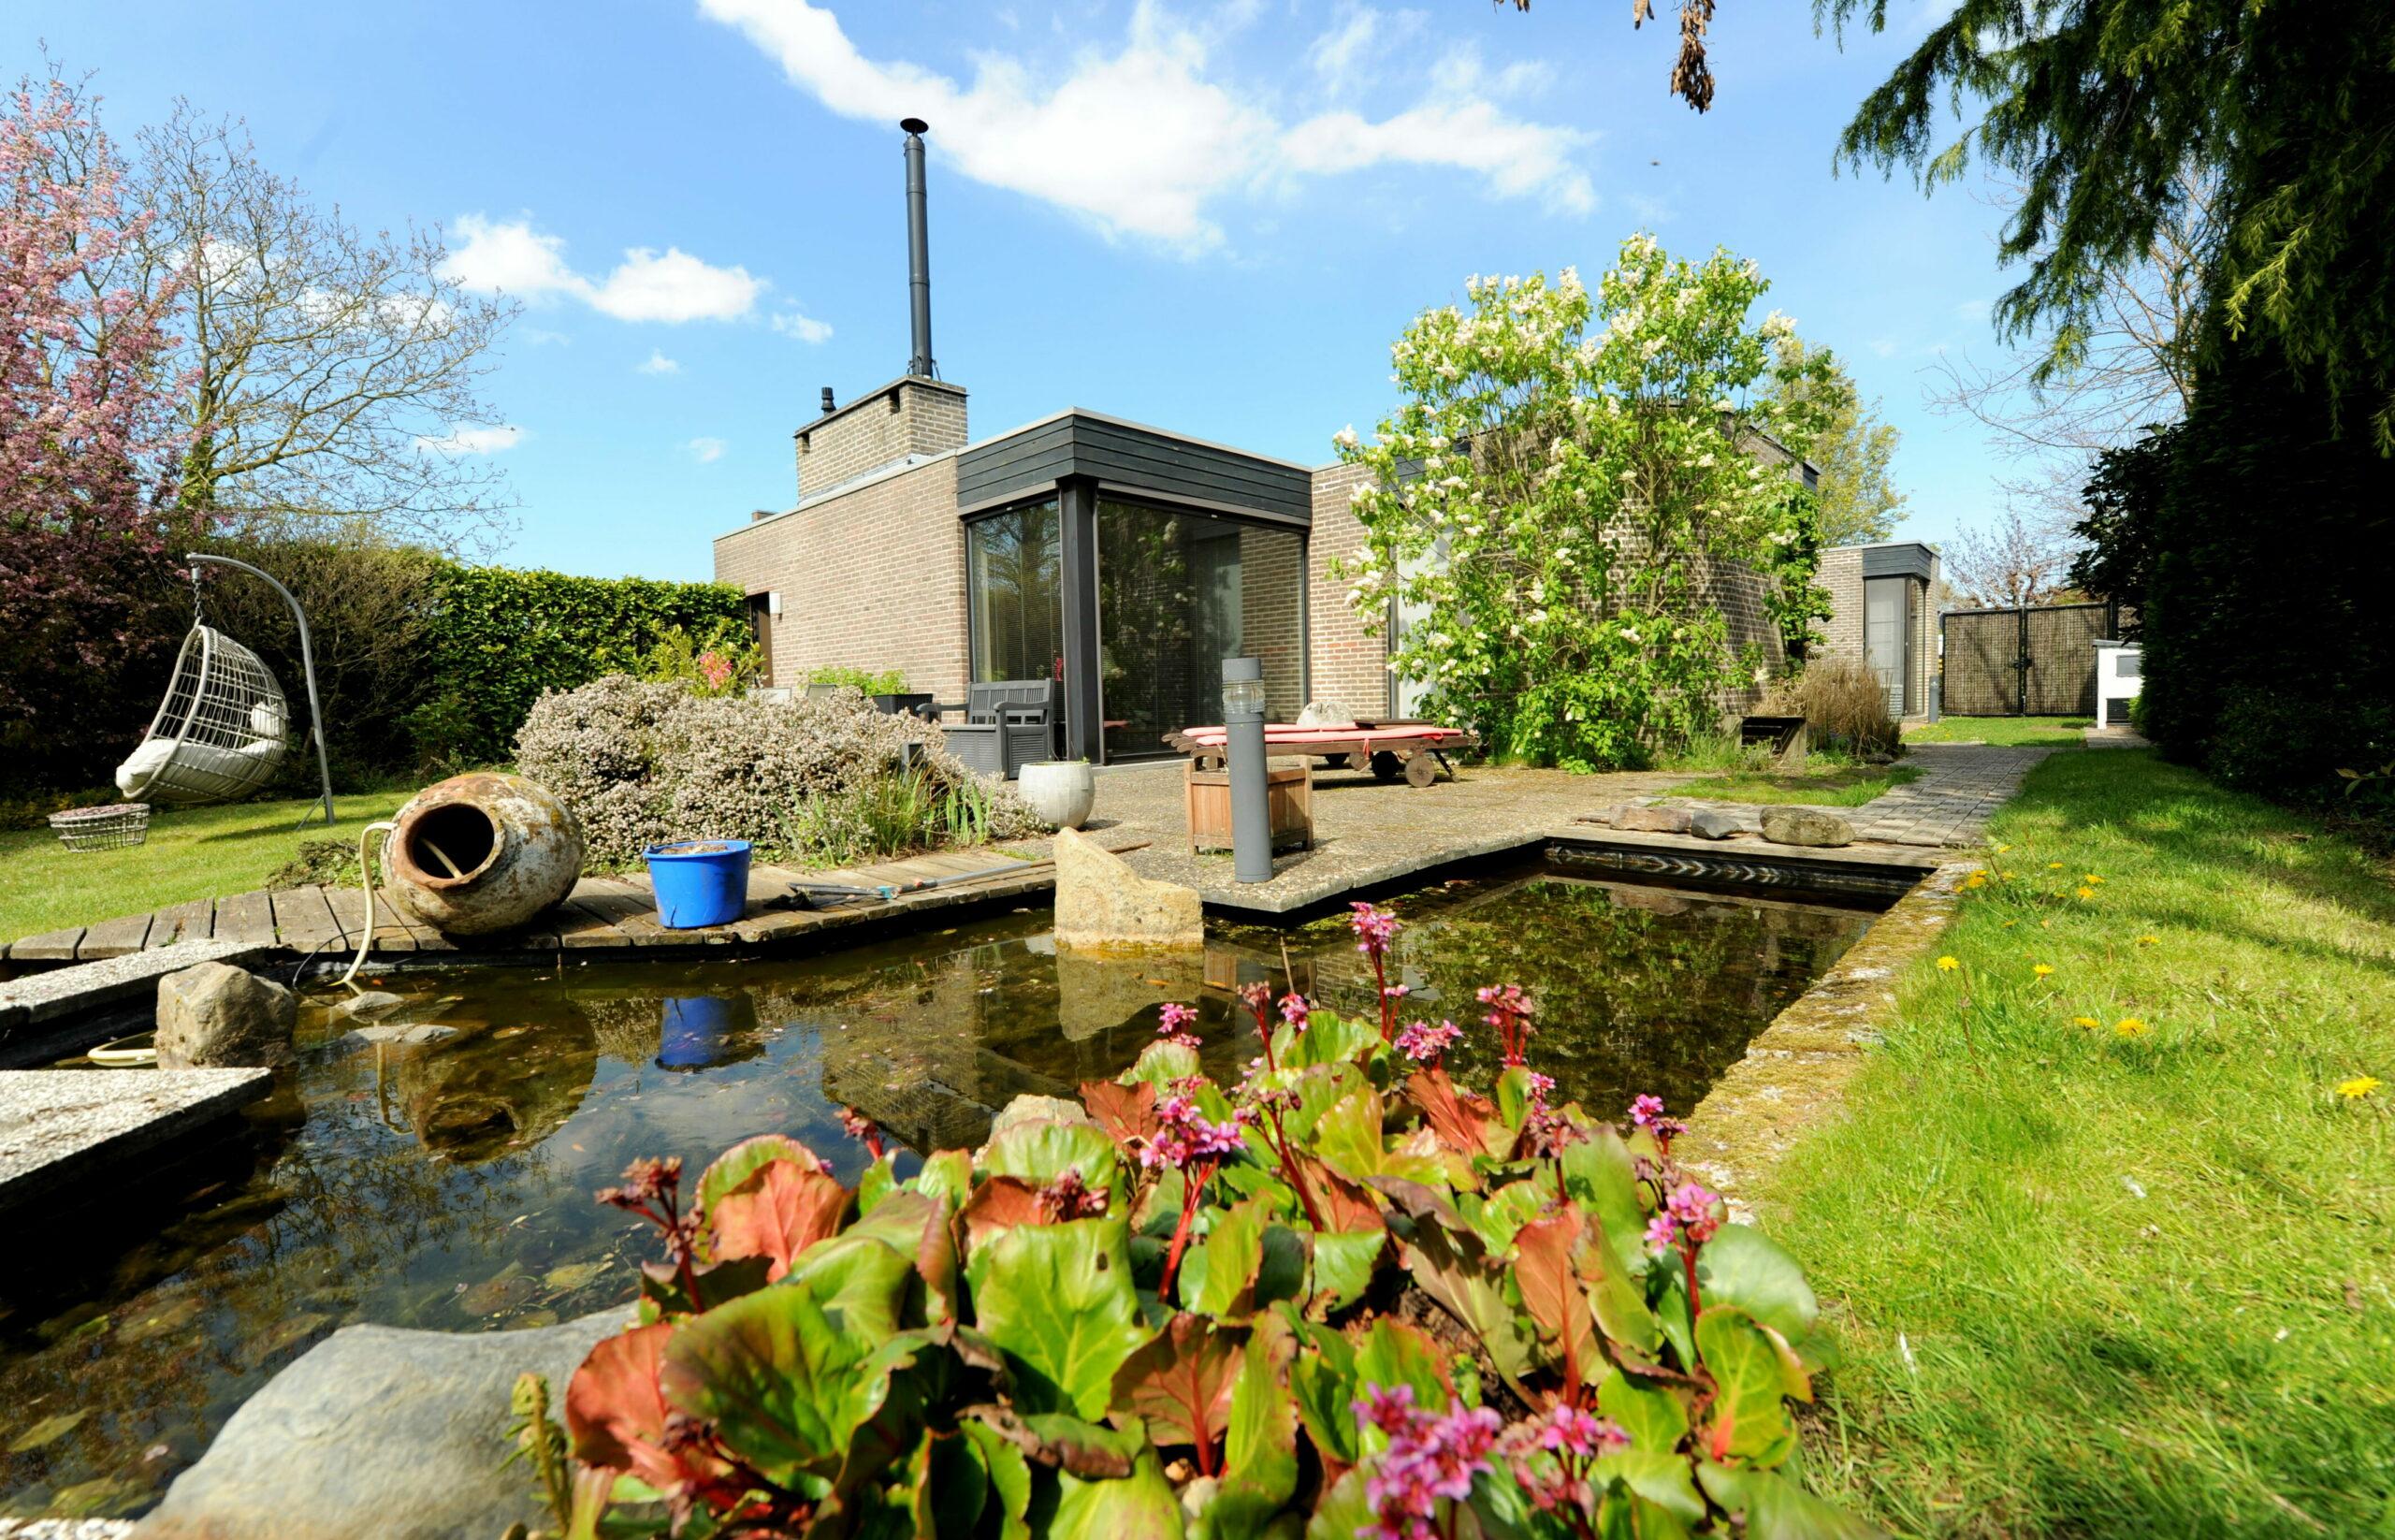 Romantisch wonen in deze moderne bungalow